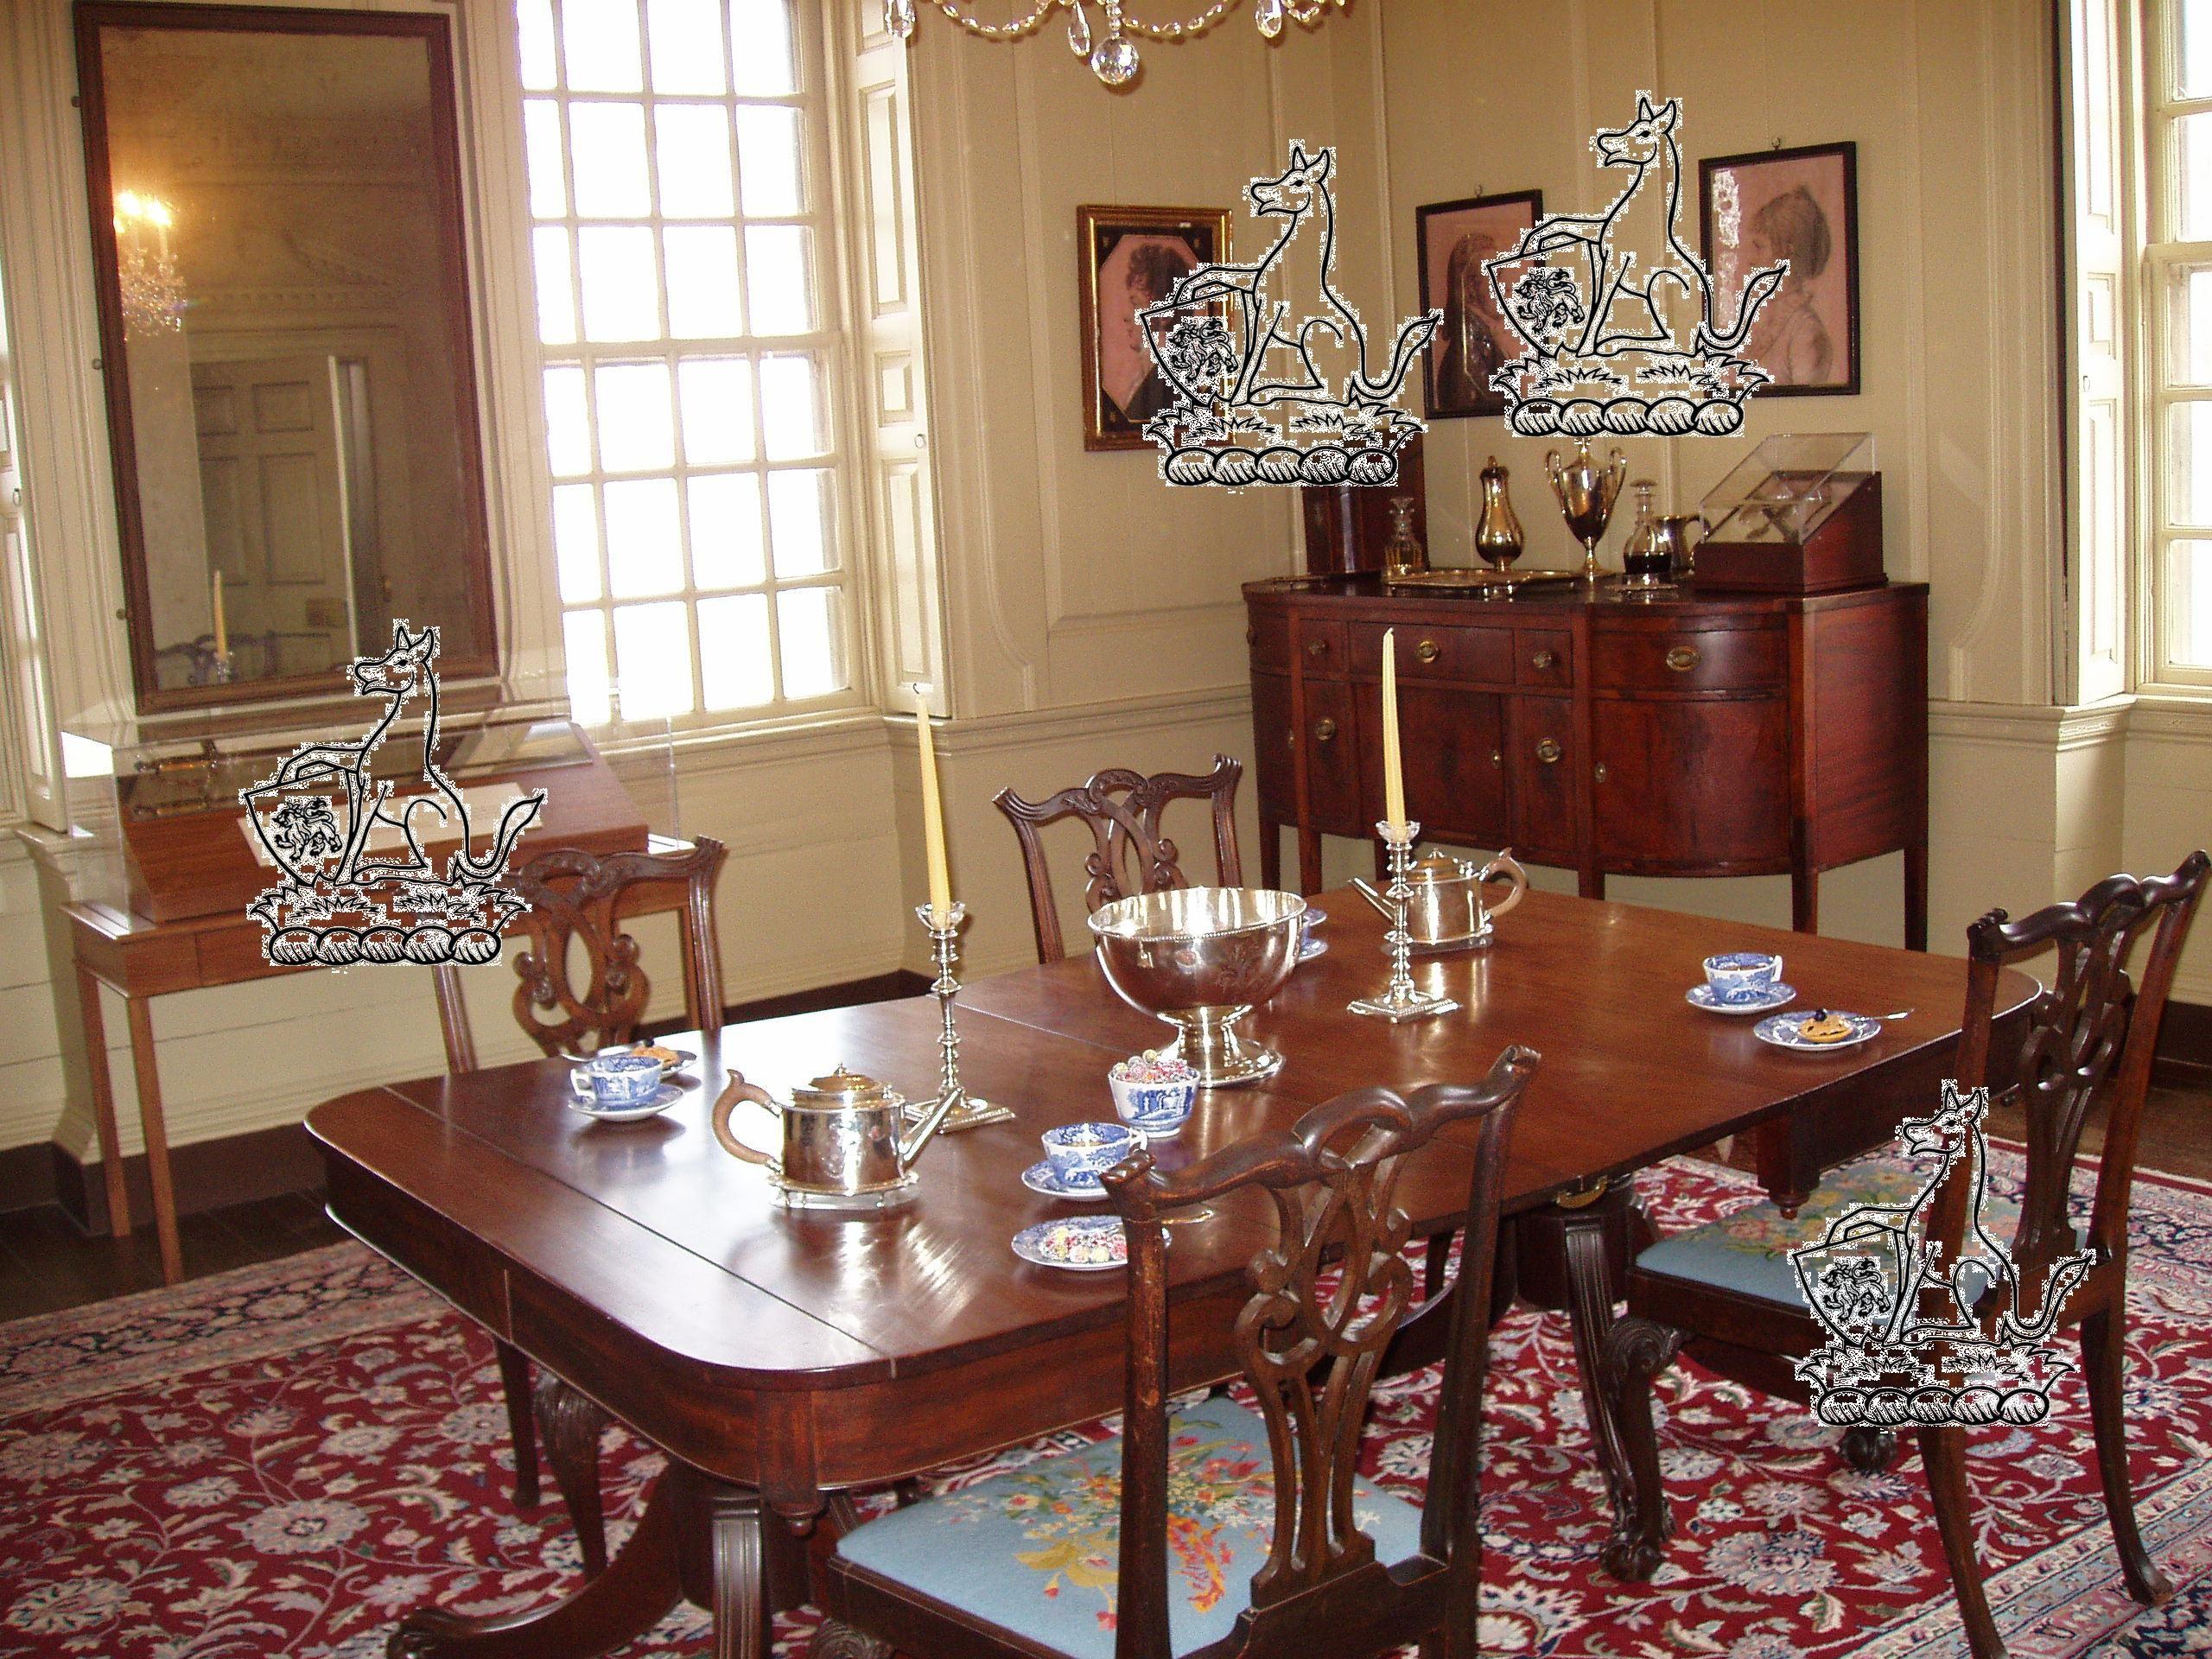 The Dining Room inside Shirley Plantation, Virginia. I